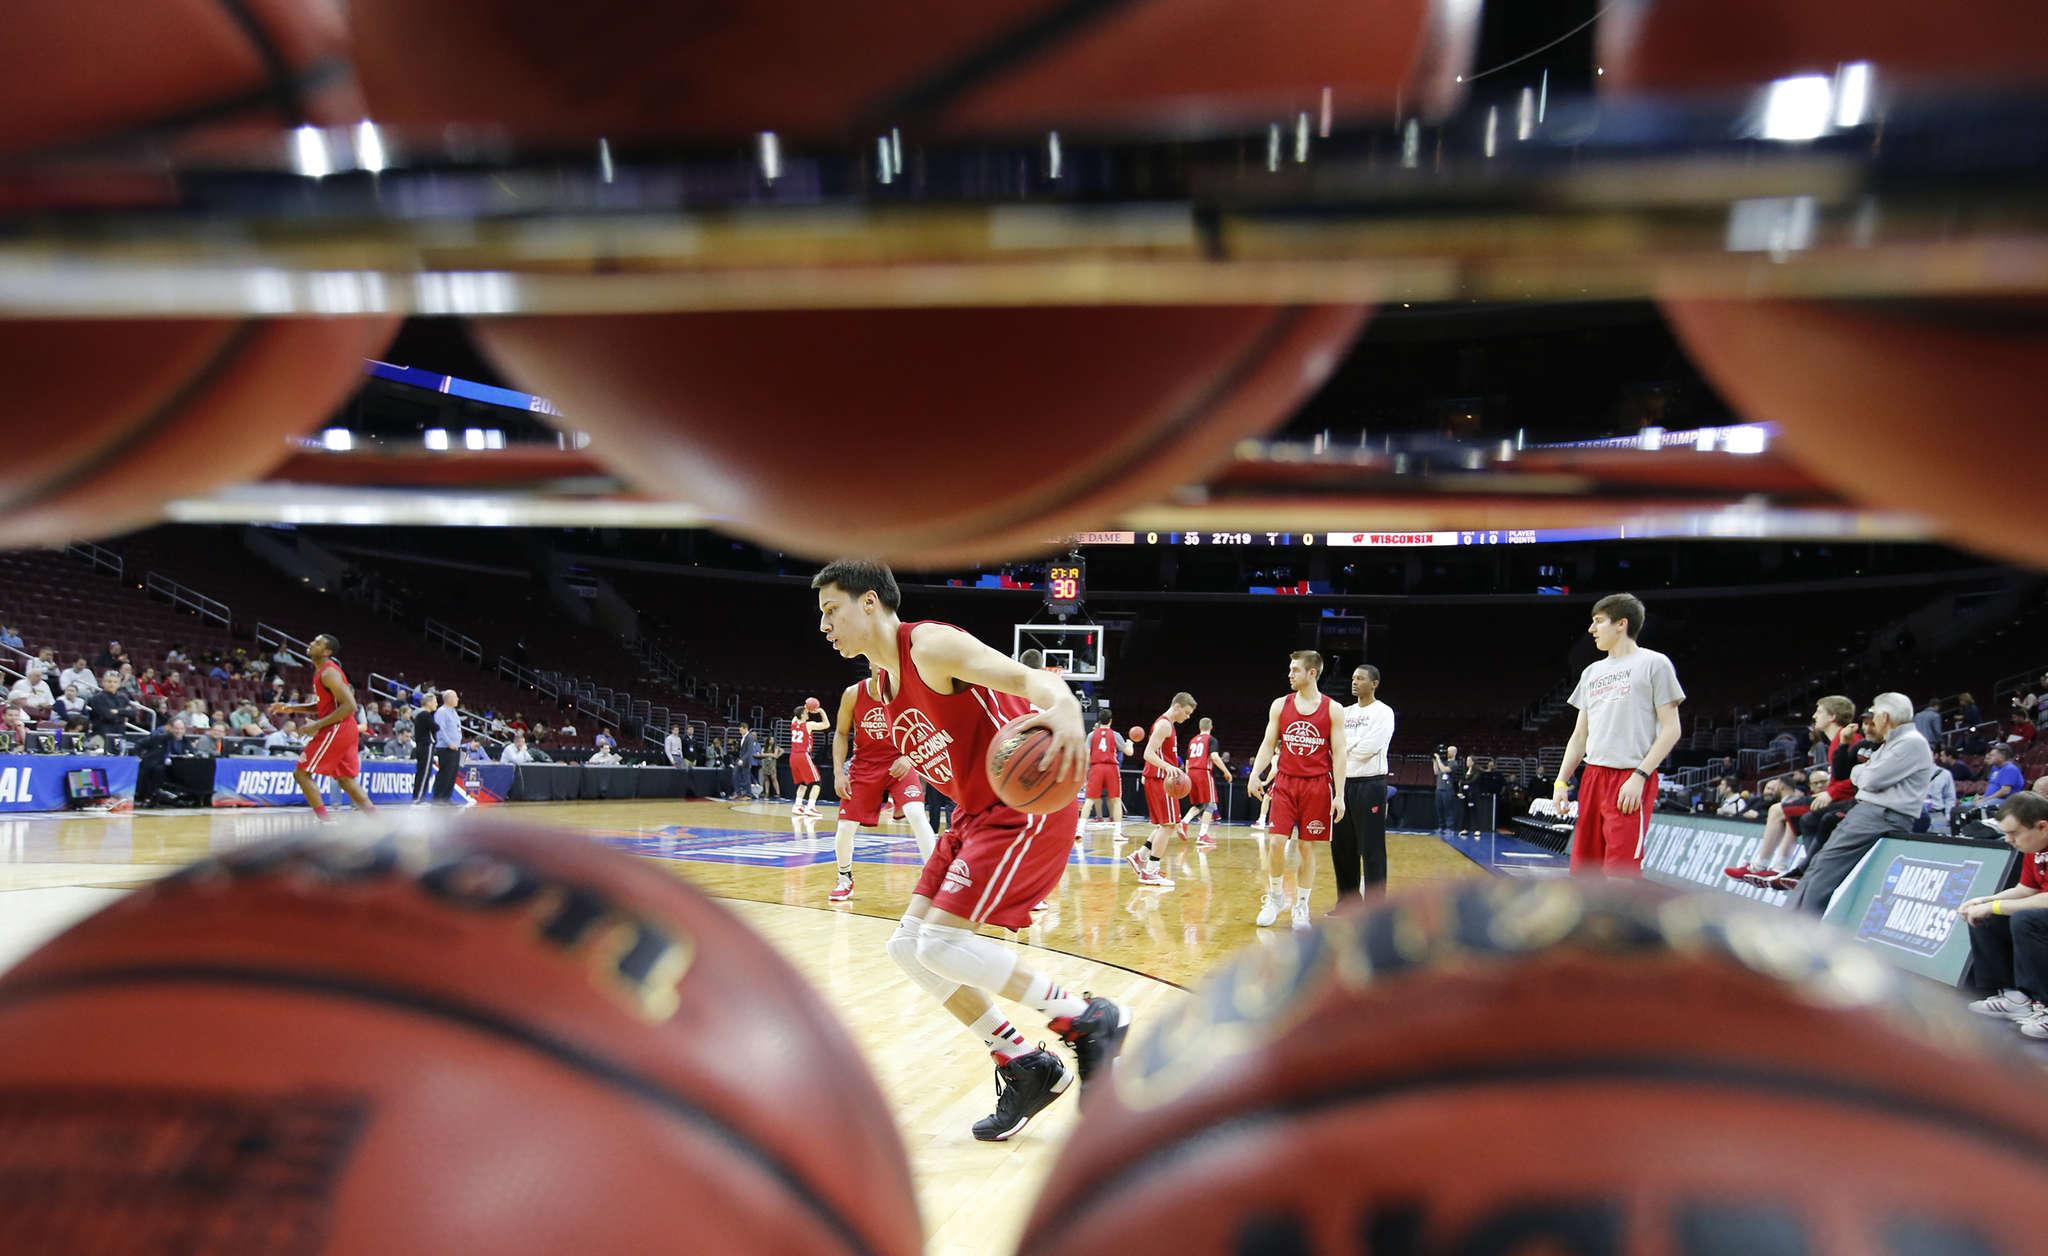 Viewed through a rack of basketballs,Wisconsin´s Bronson Koenig goes through drills. CHARLES FOX /Staff Photographer